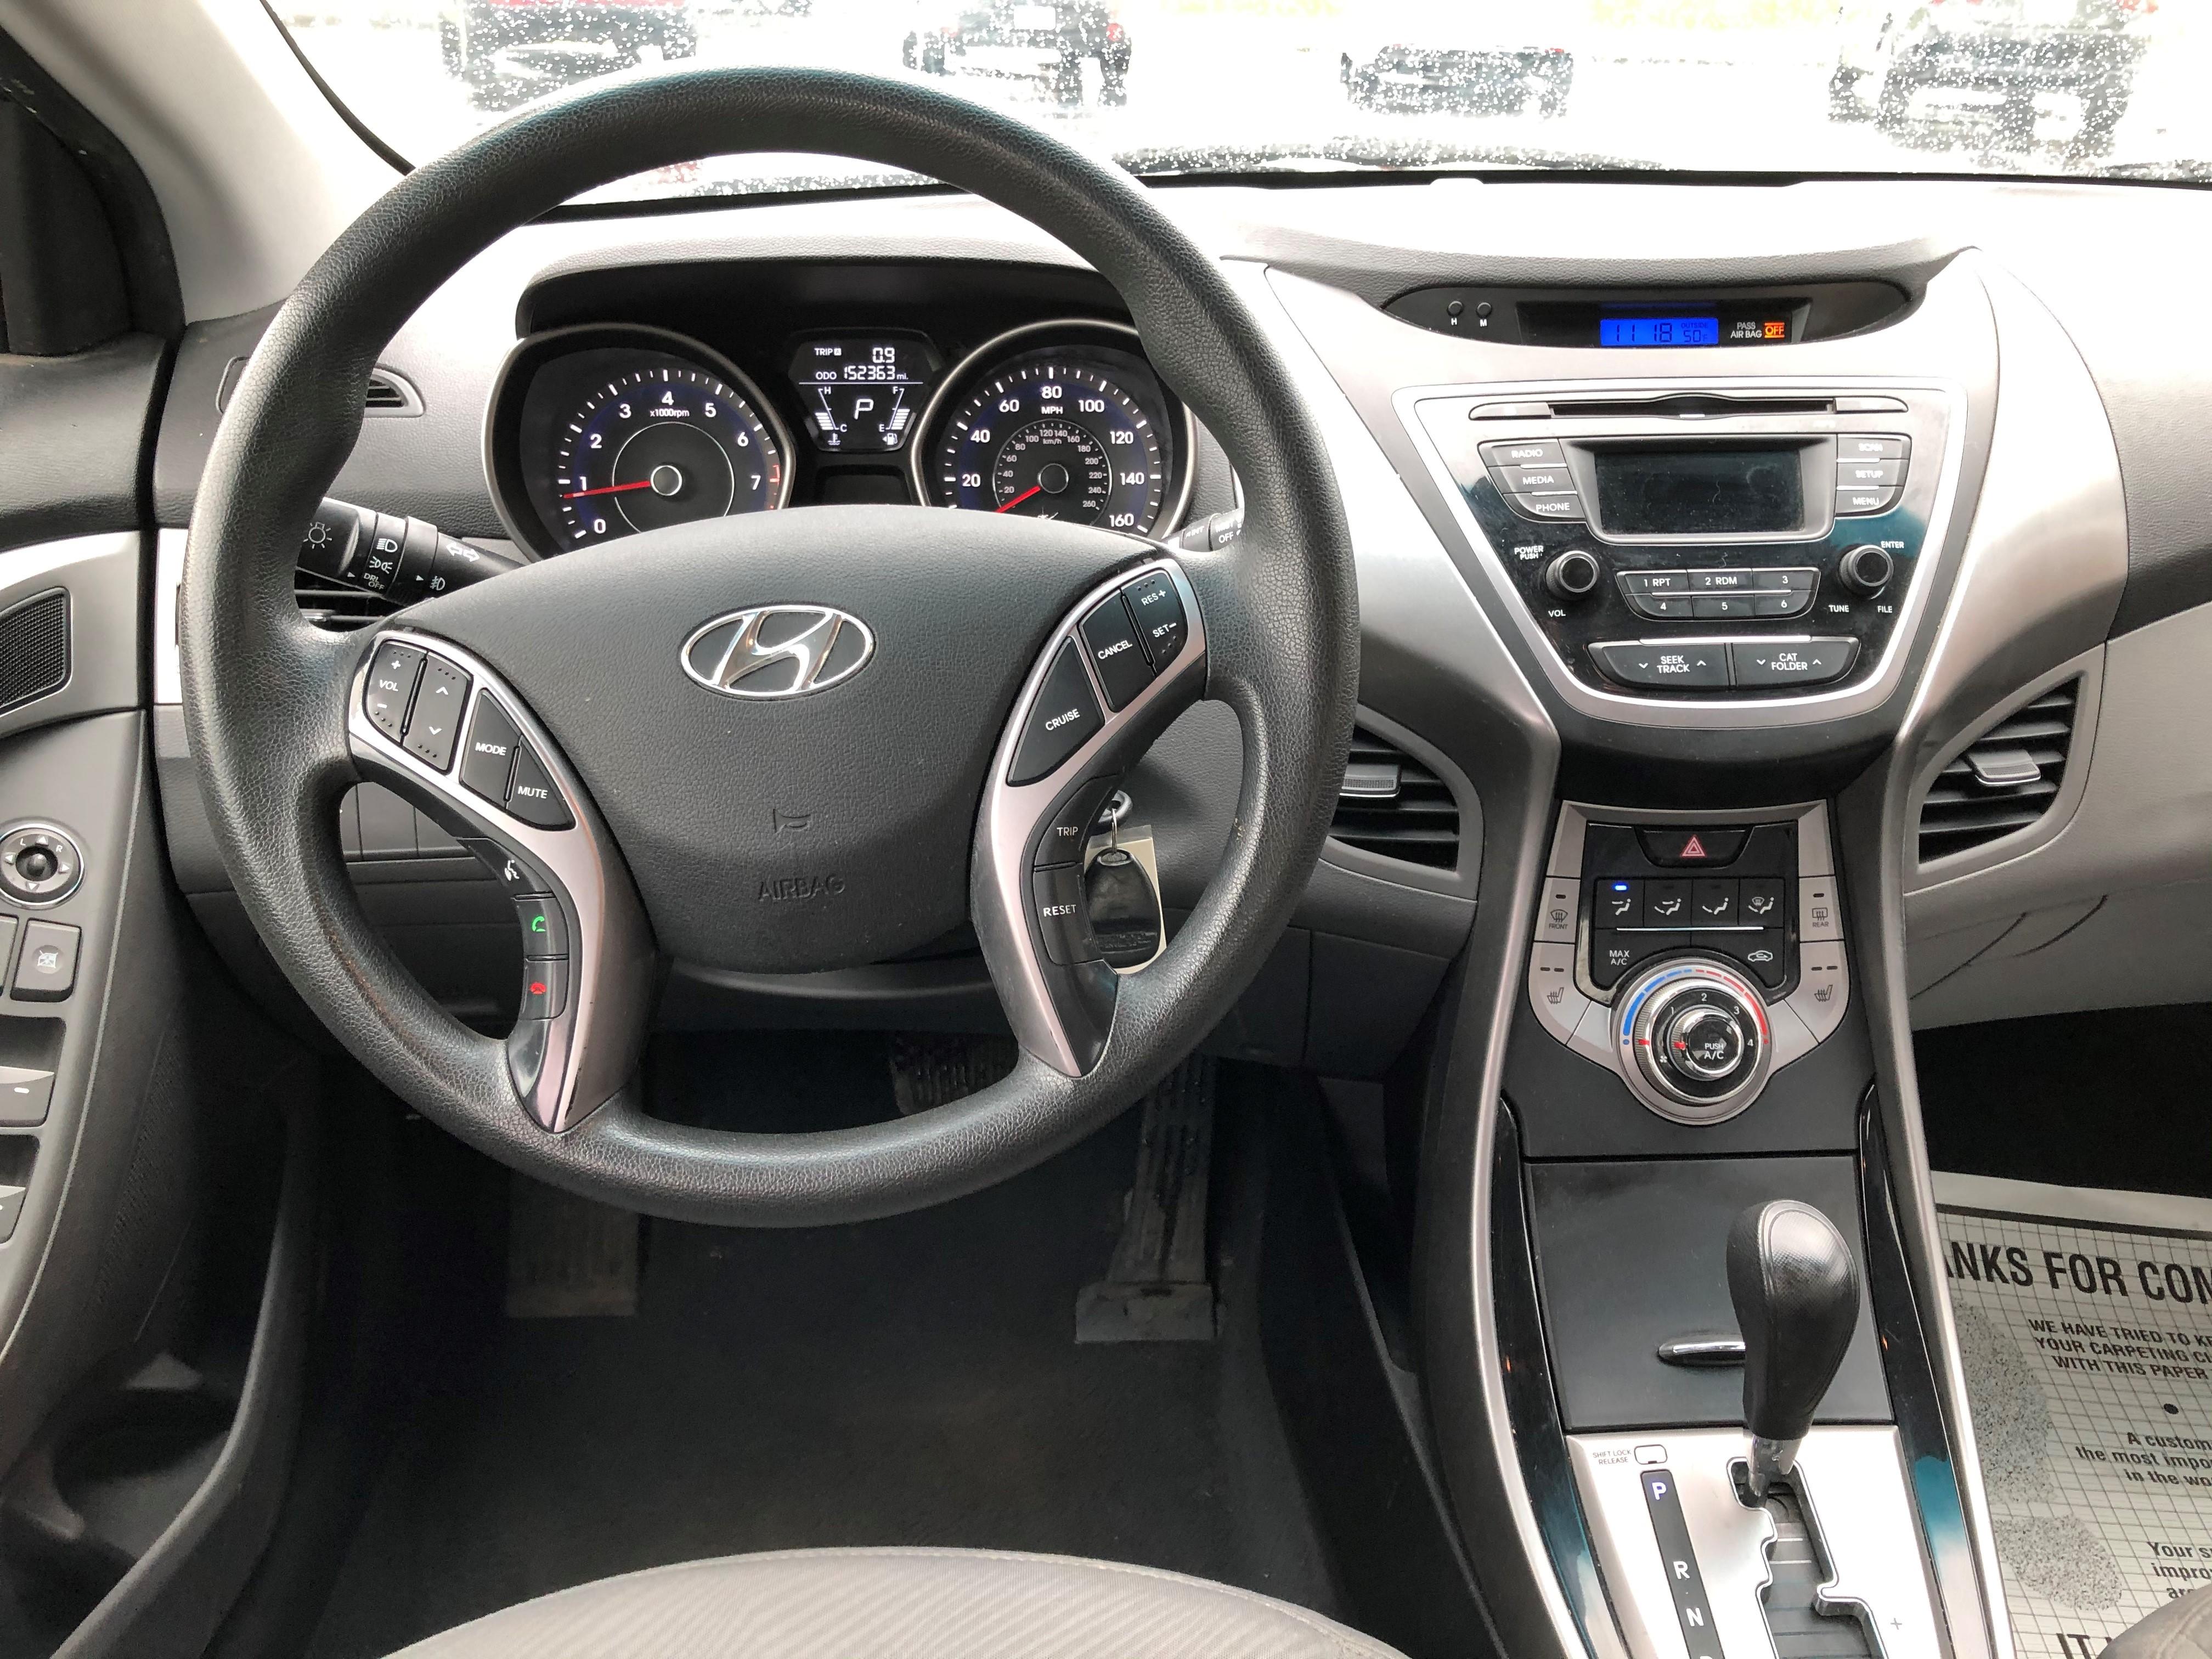 used vehicle - Sedan Hyundai Elantra 2013